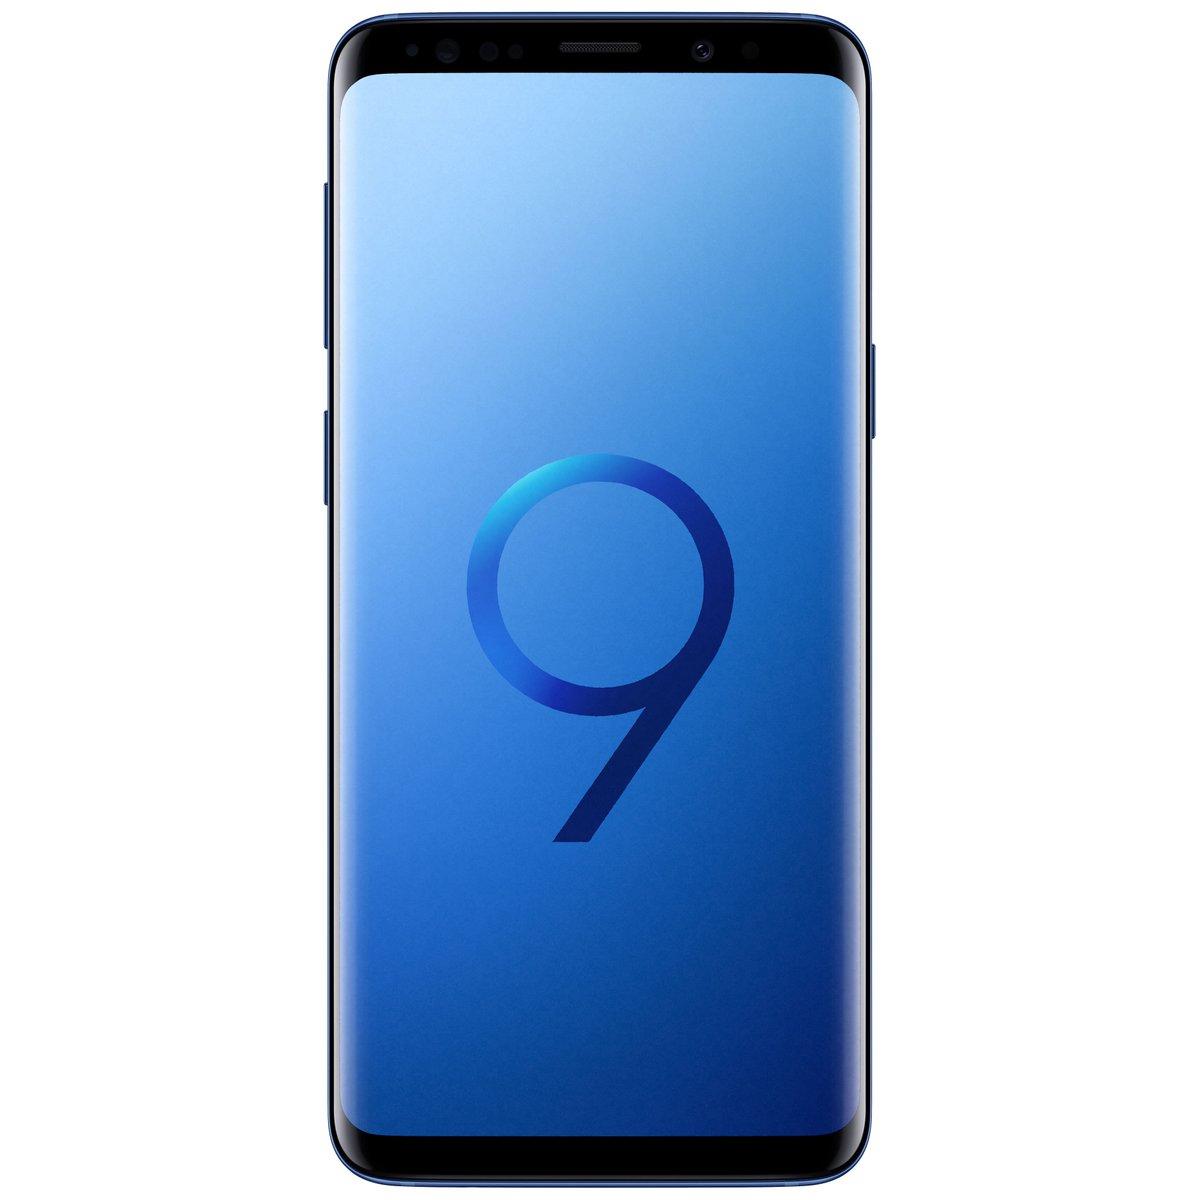 سامسونگ گلکسی اس 9 / Samsung Galaxy S9